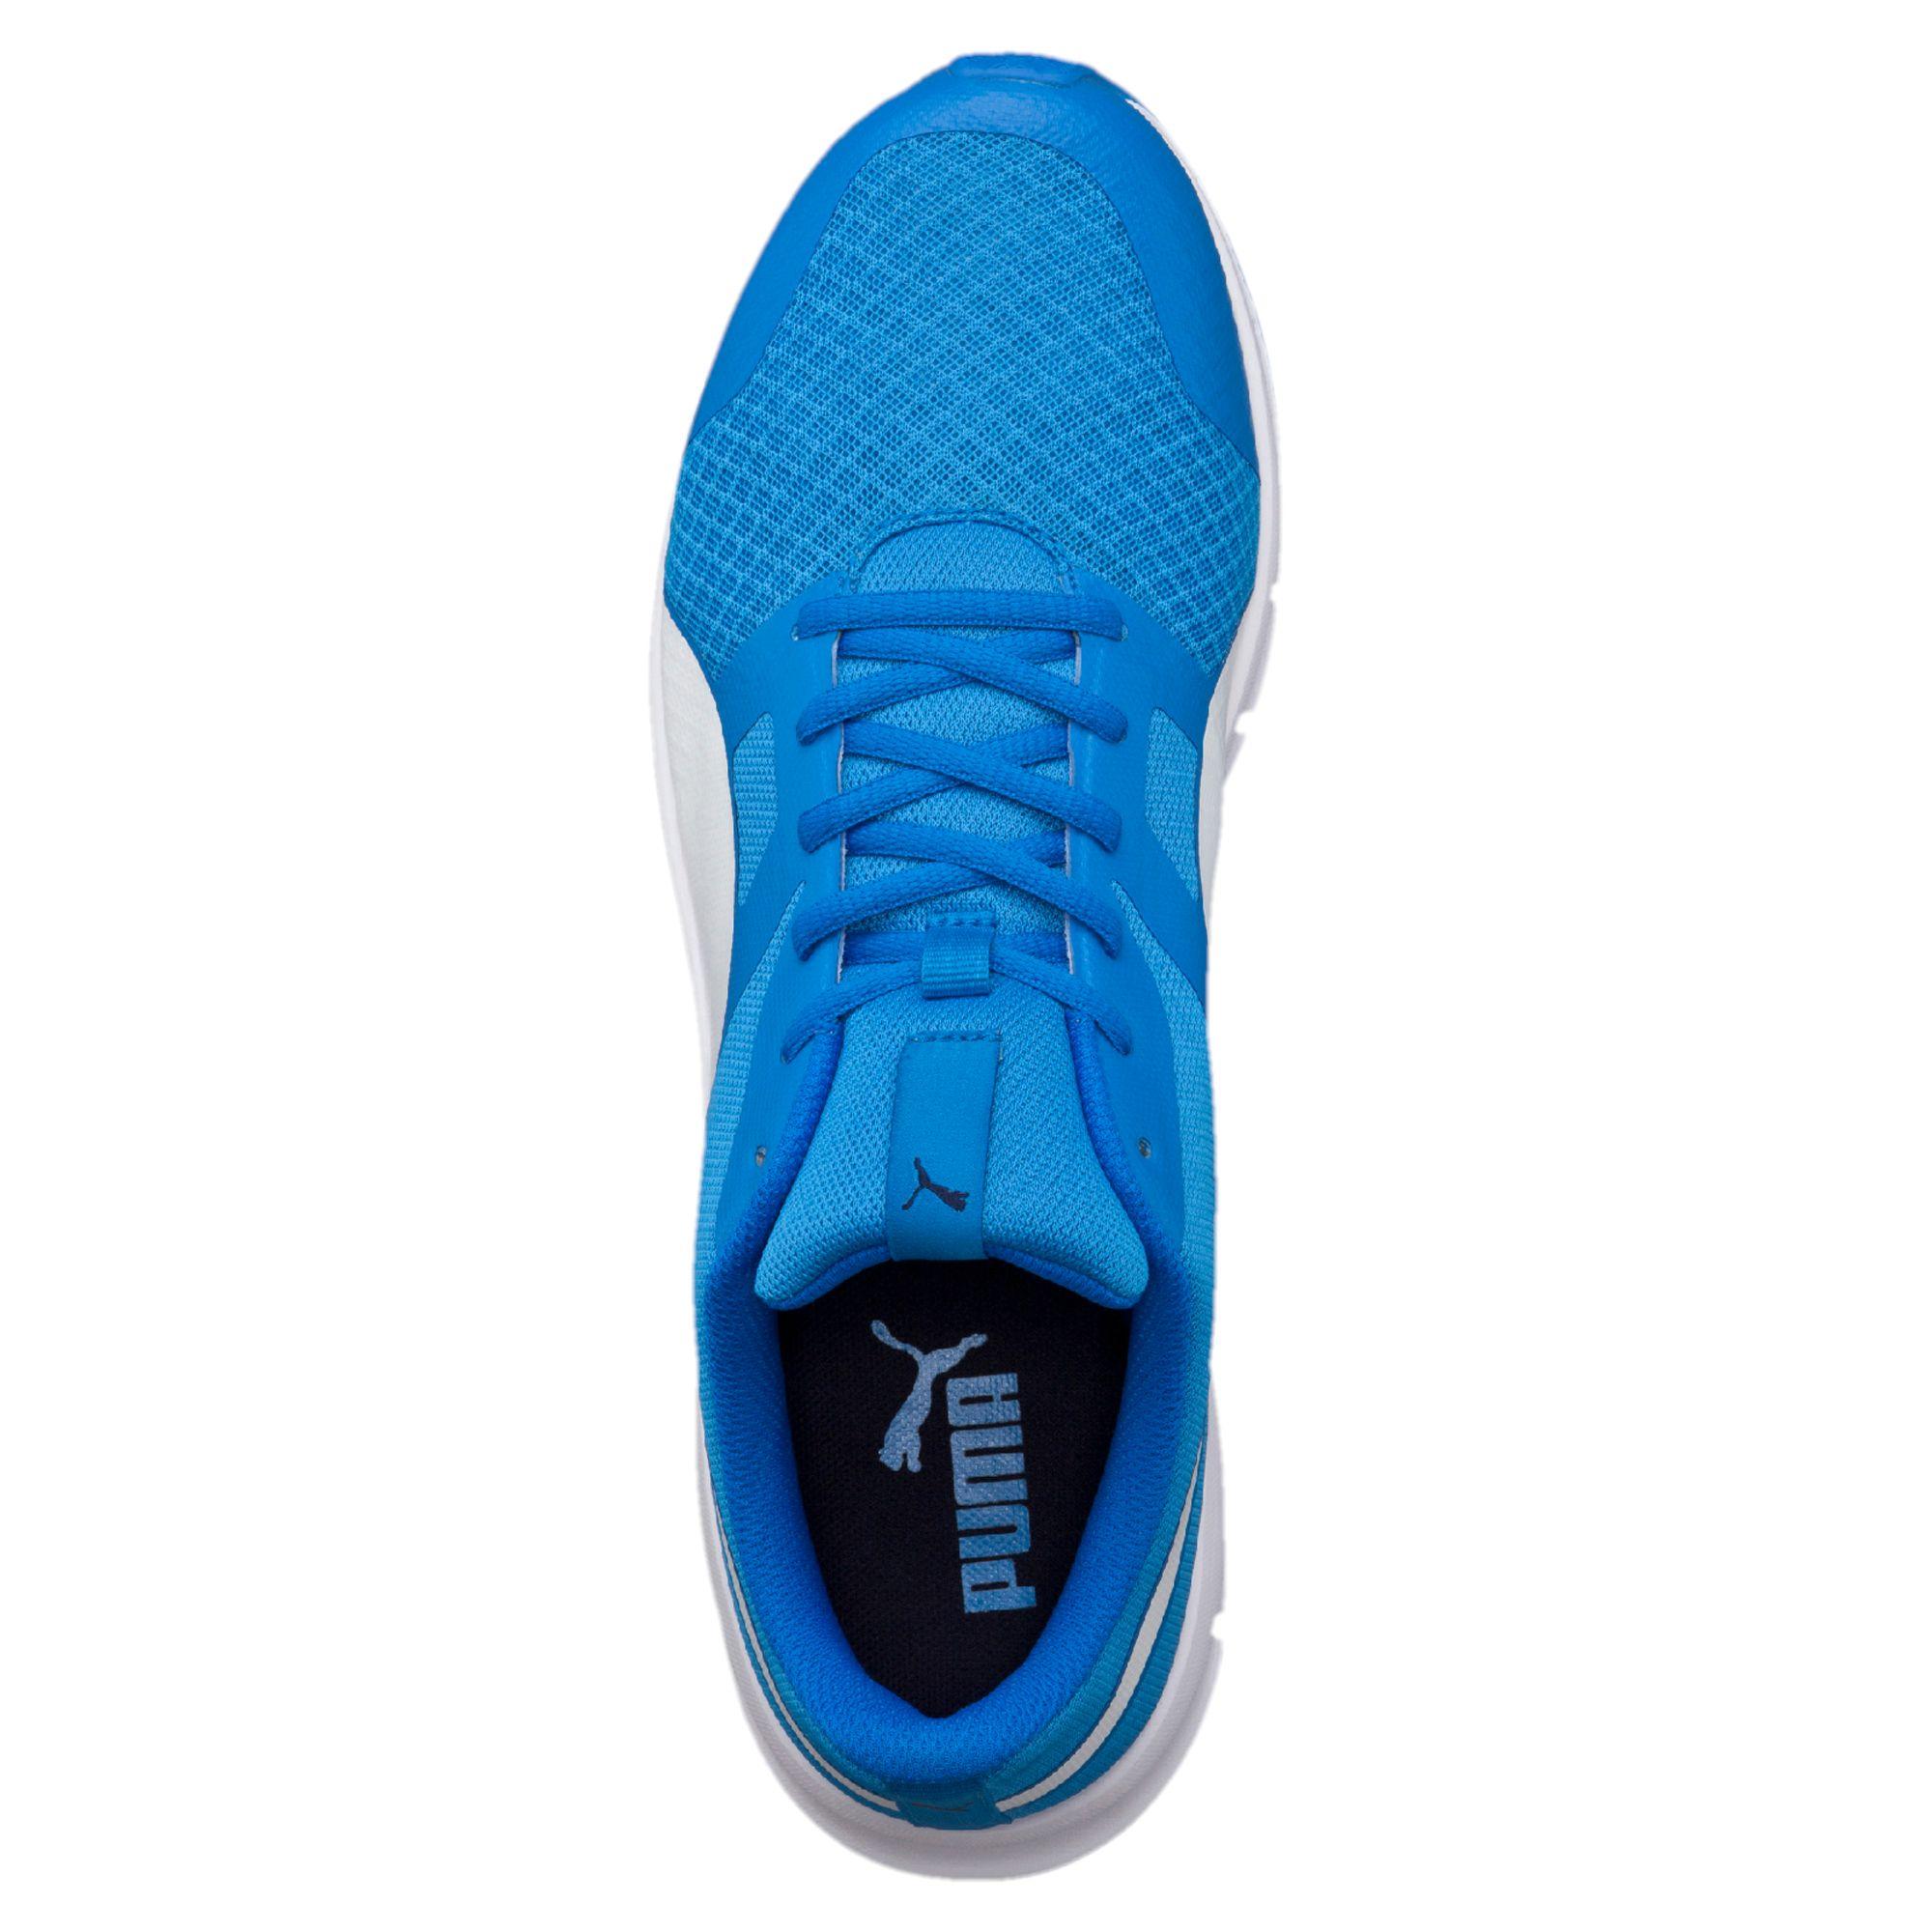 Chaussures Puma Flexracer Basket Neuf Basiques Hommes Ebay qrzrt